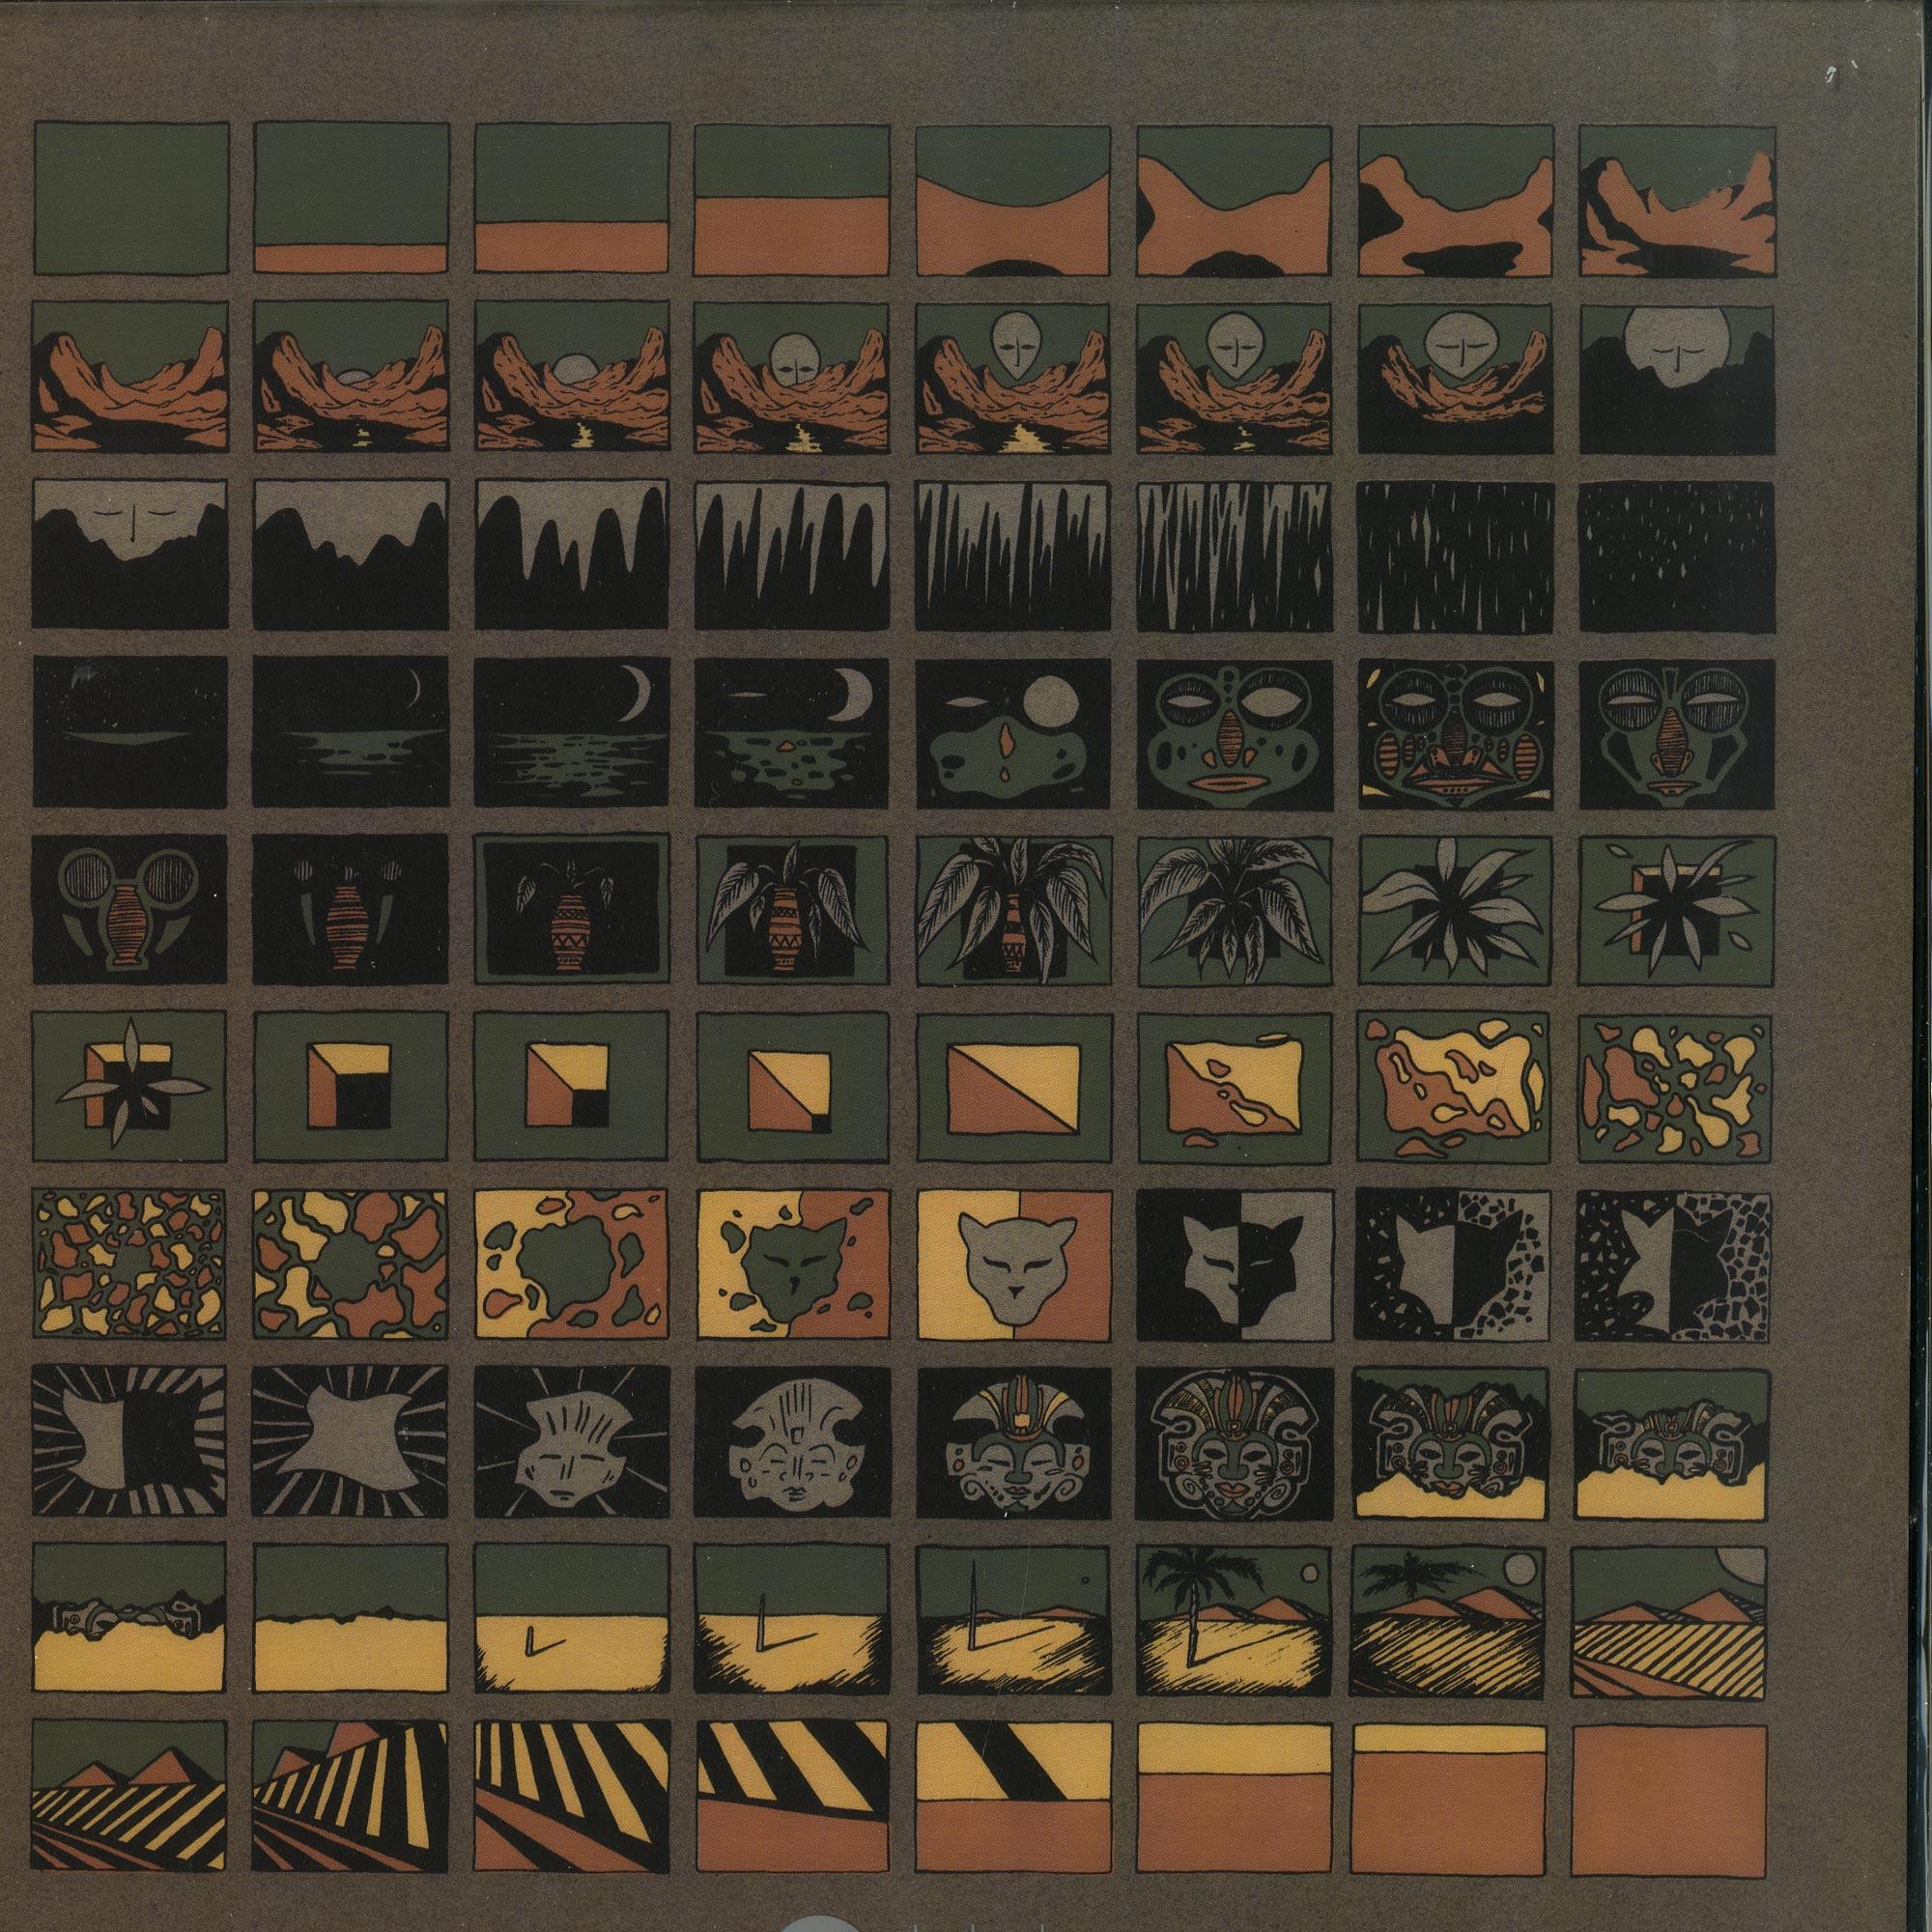 Ferro / William Caycedo / Malin Genie / Ingi Visions - RAW JOINTS 6.1